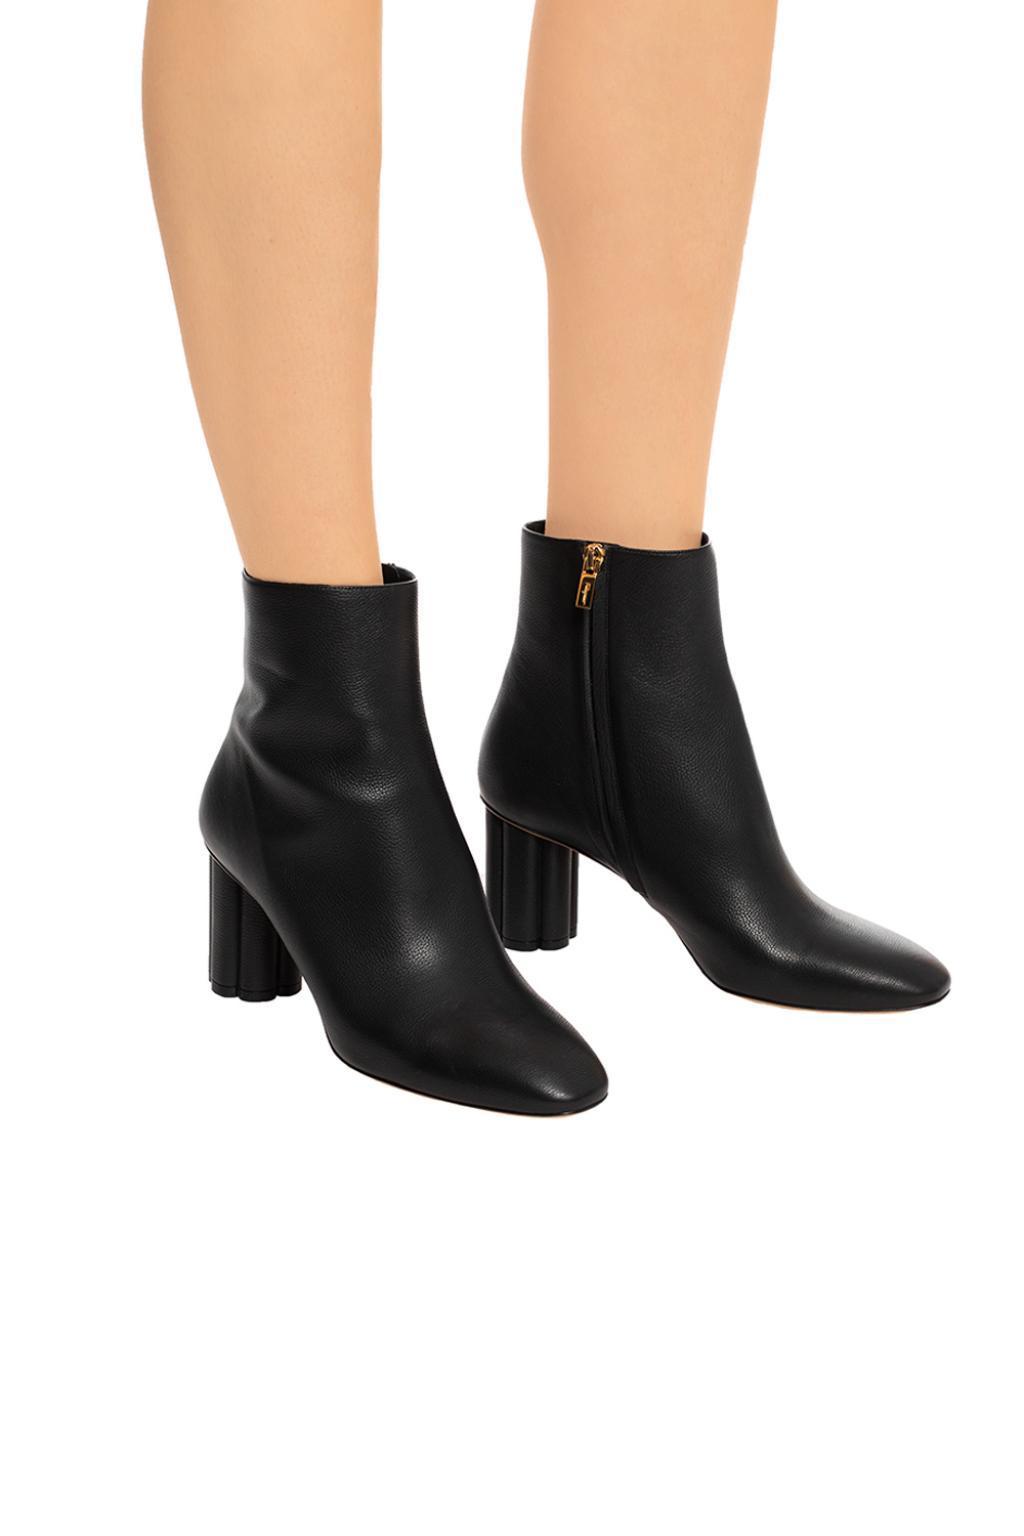 Ferragamo Leather 'molfetta' Heeled Ankle Boots in Black